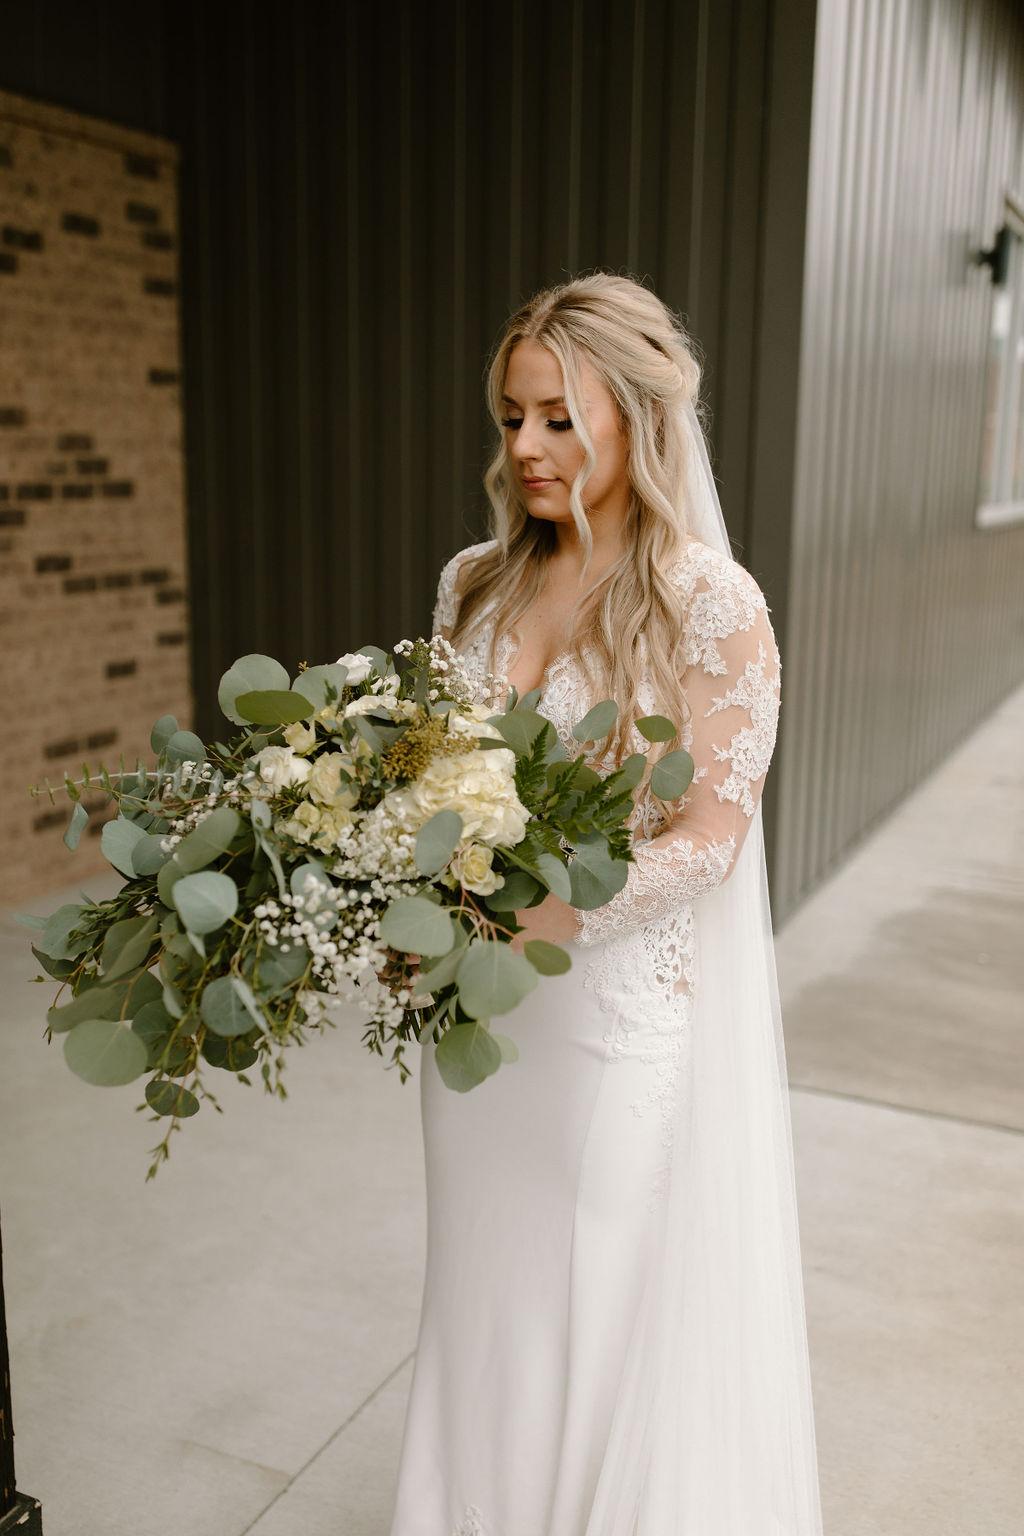 T. Villager wedding bouquet | Nashville Bride Guide